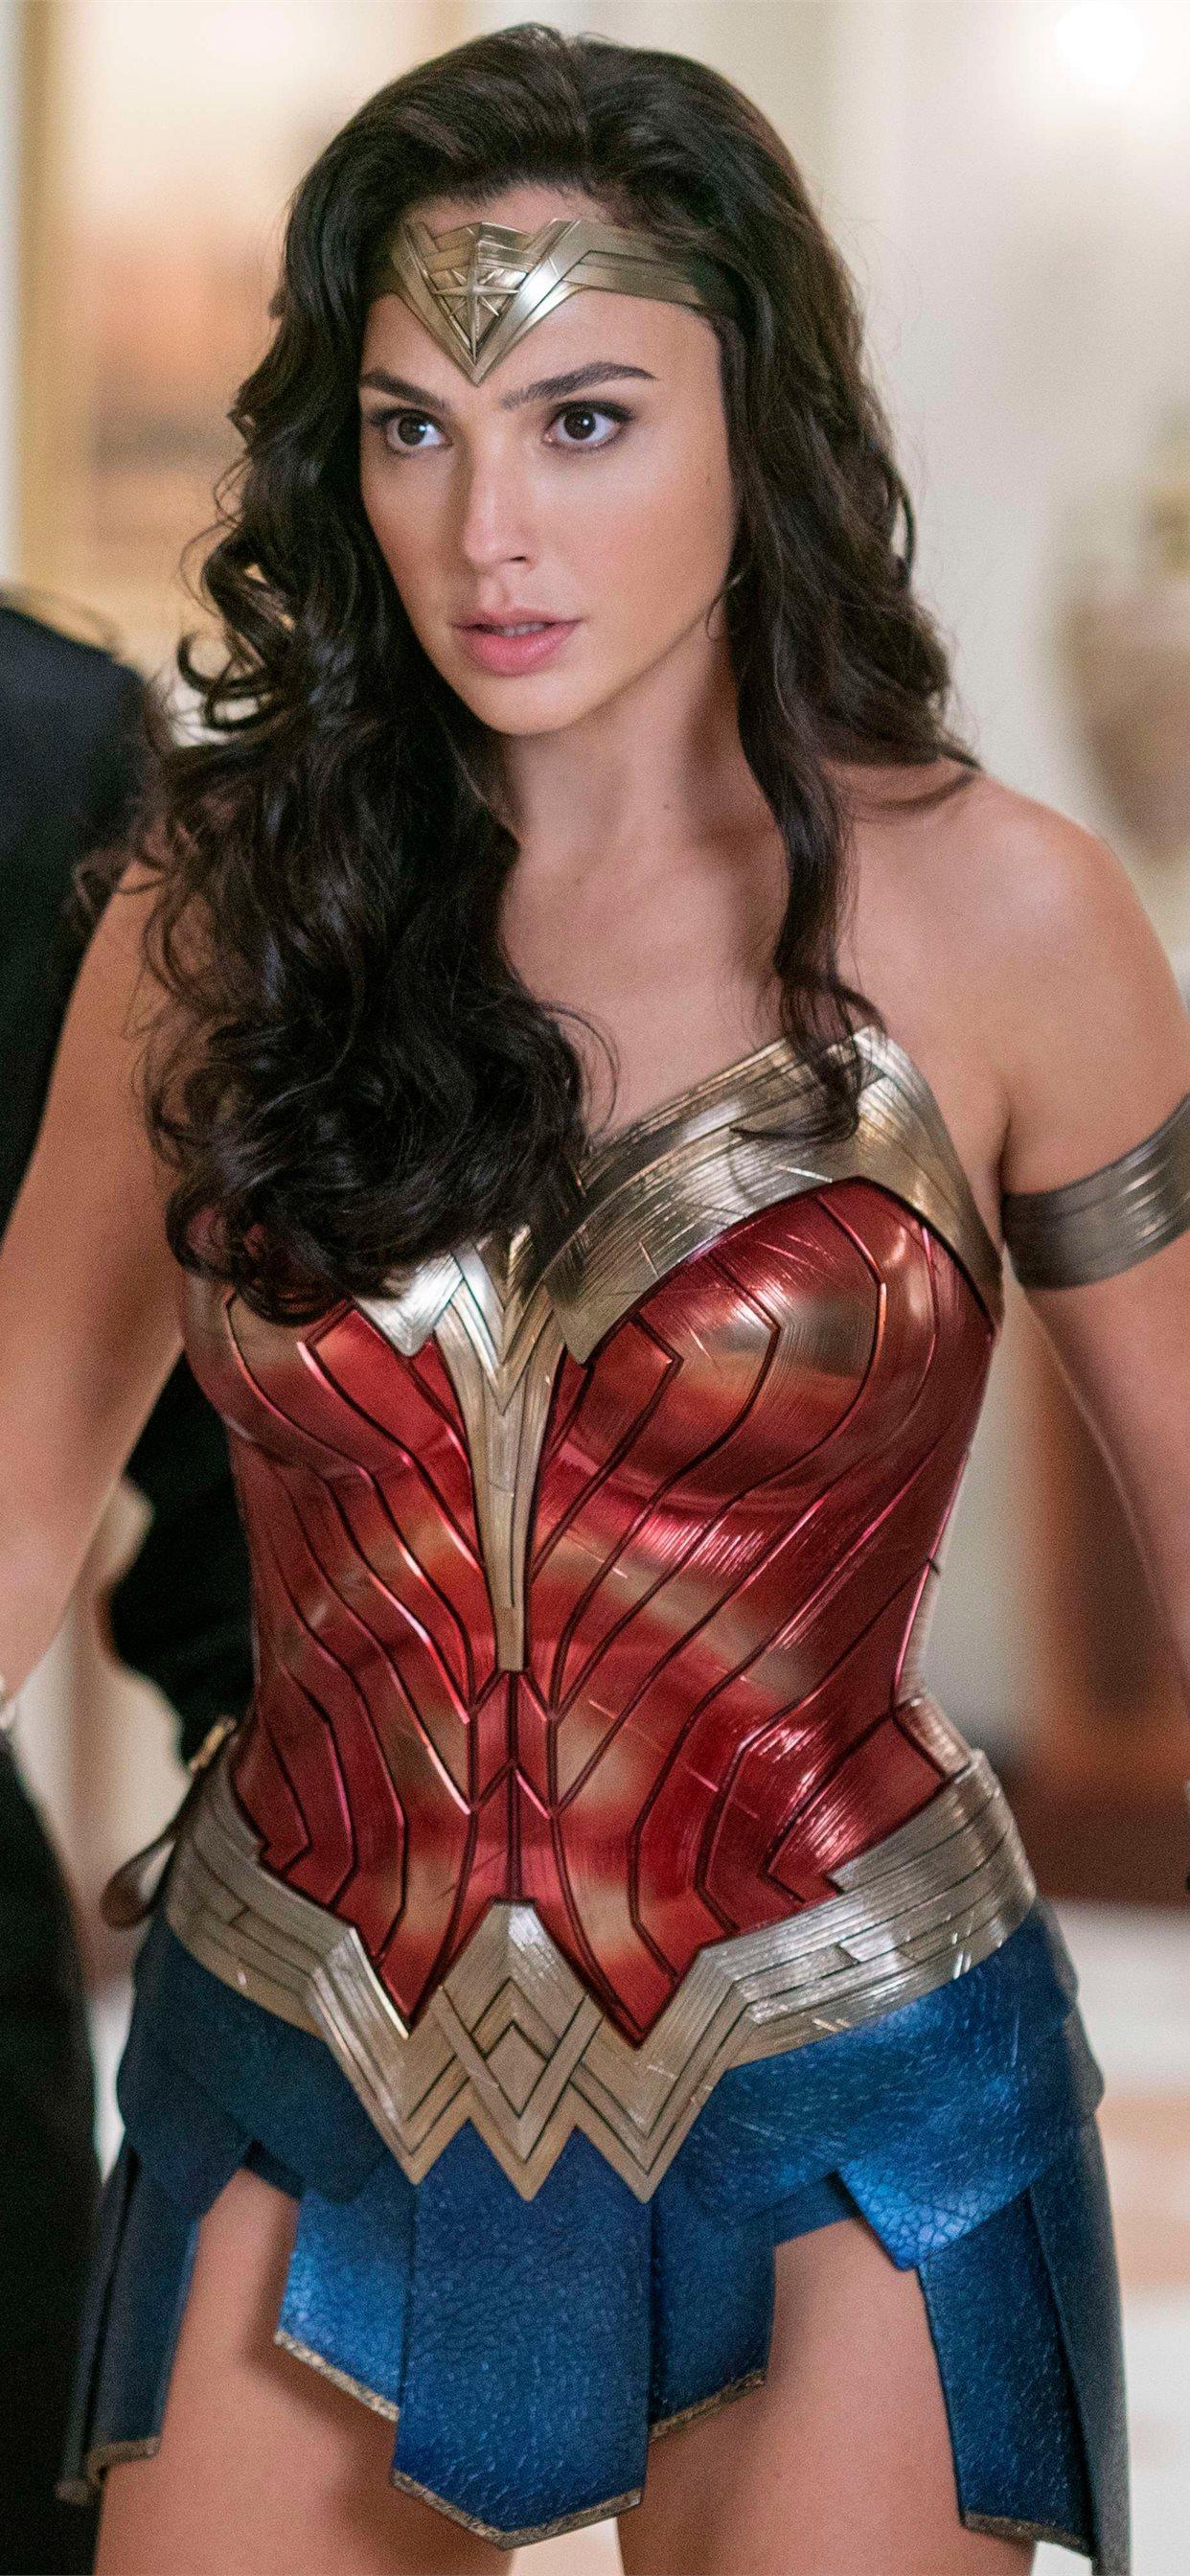 Wonder Woman Theme Song   Movie Theme Songs & TV Soundtracks